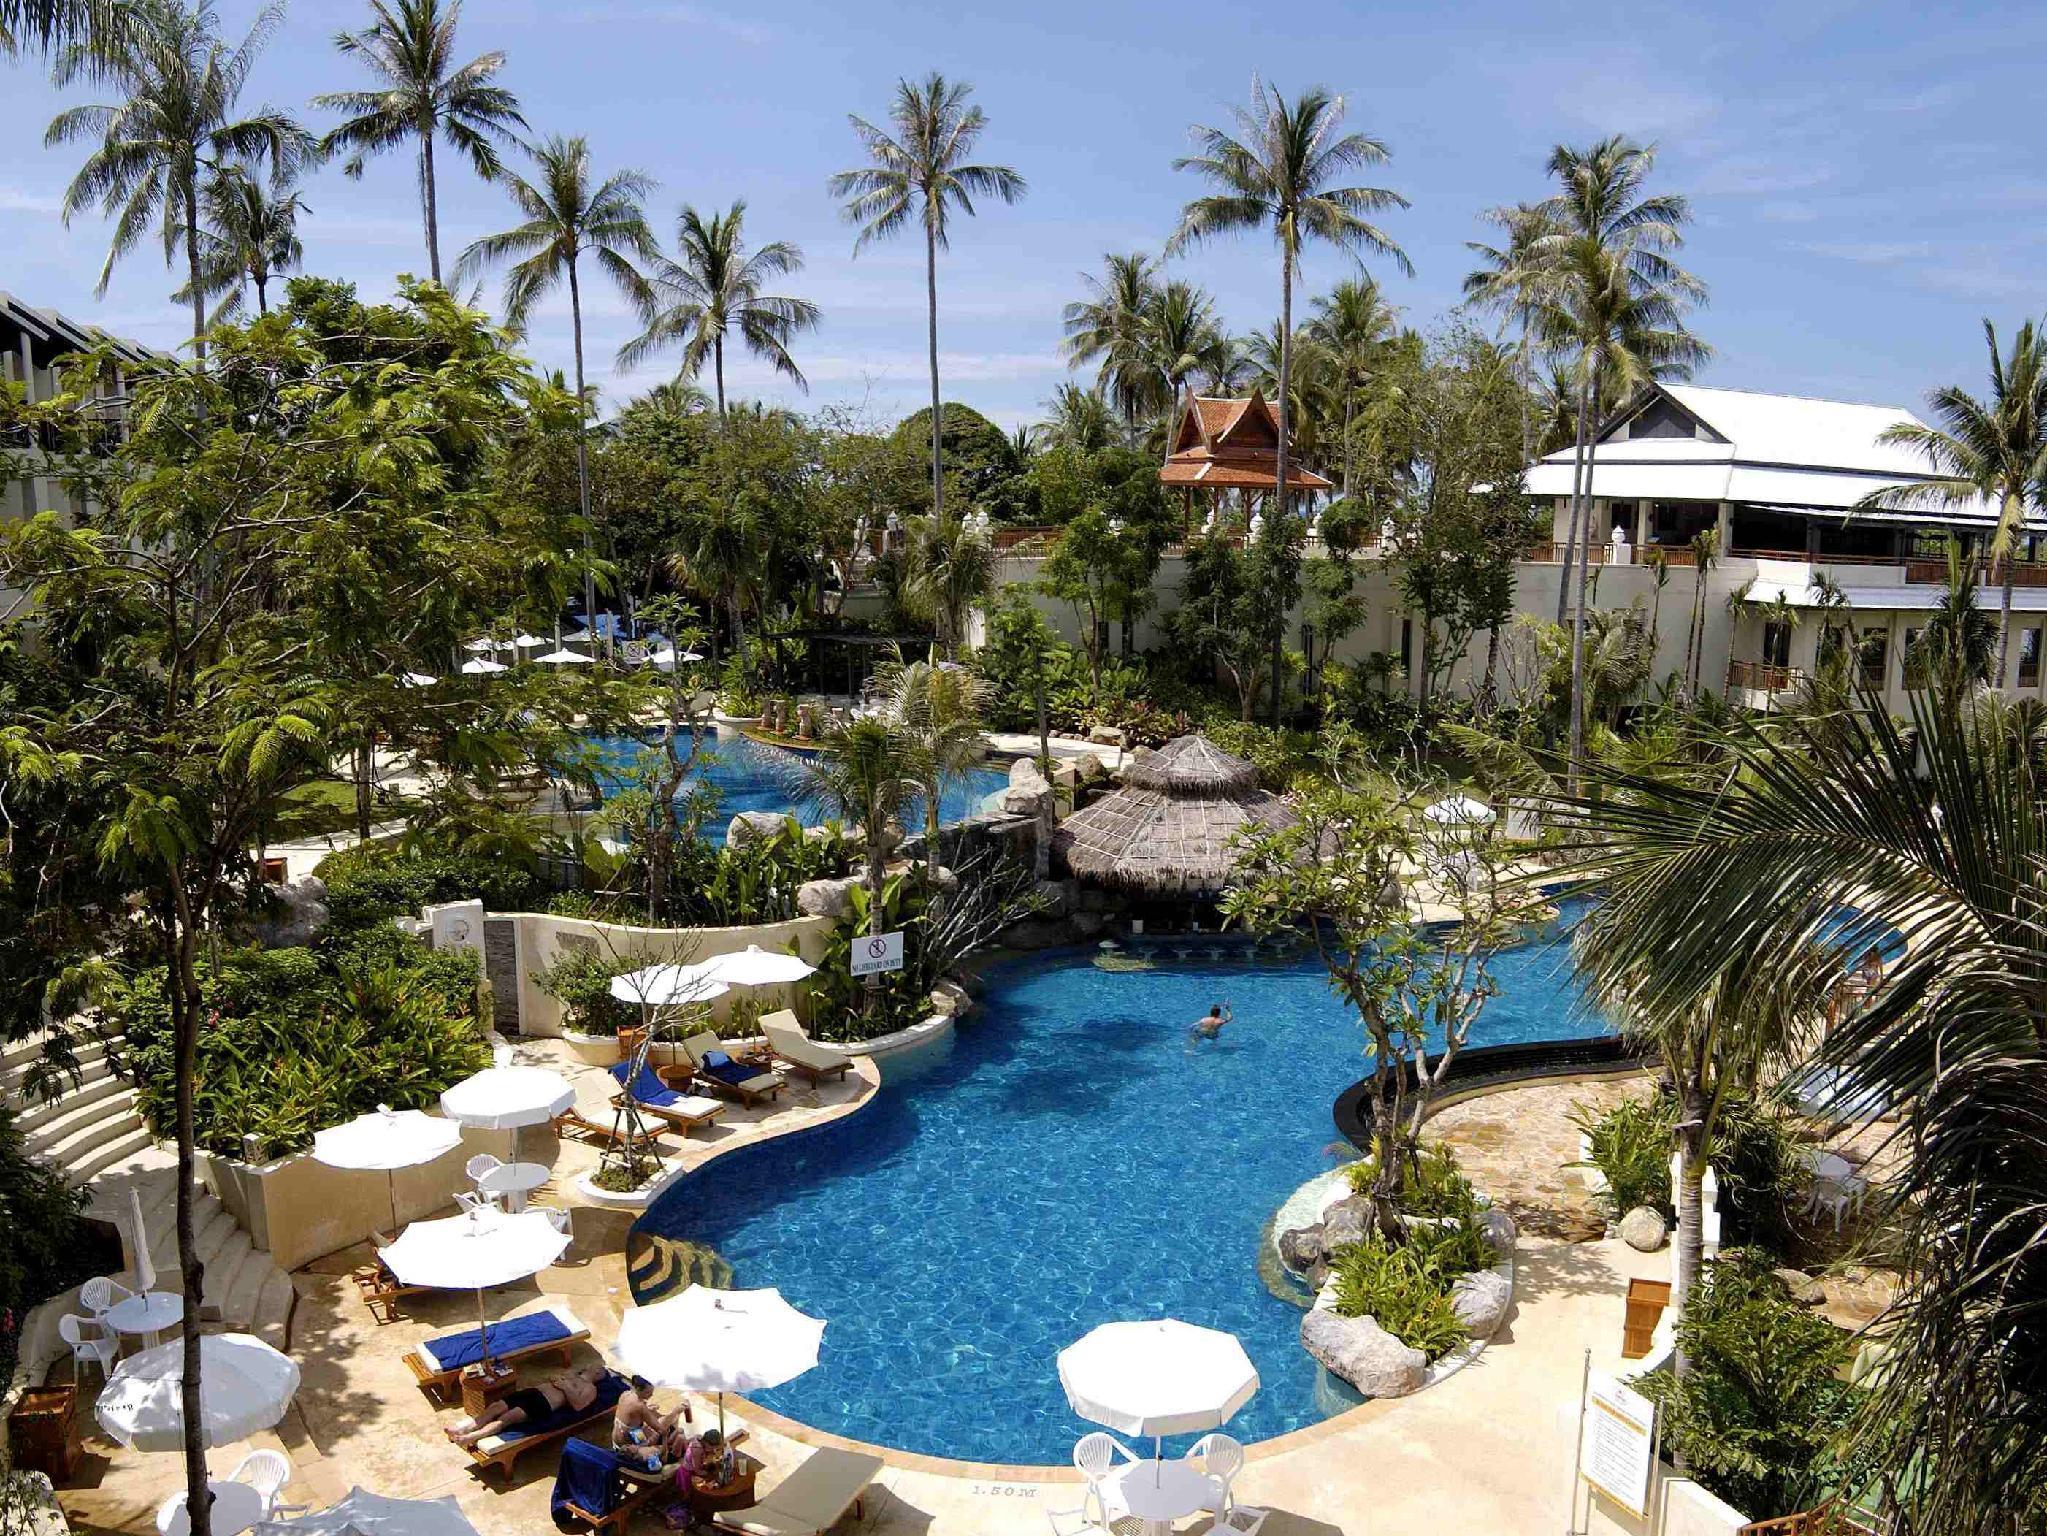 Horizon Karon Beach Resort & Spa ฮอไรซอน กะรน บีช รีสอร์ท แอนด์ สปา